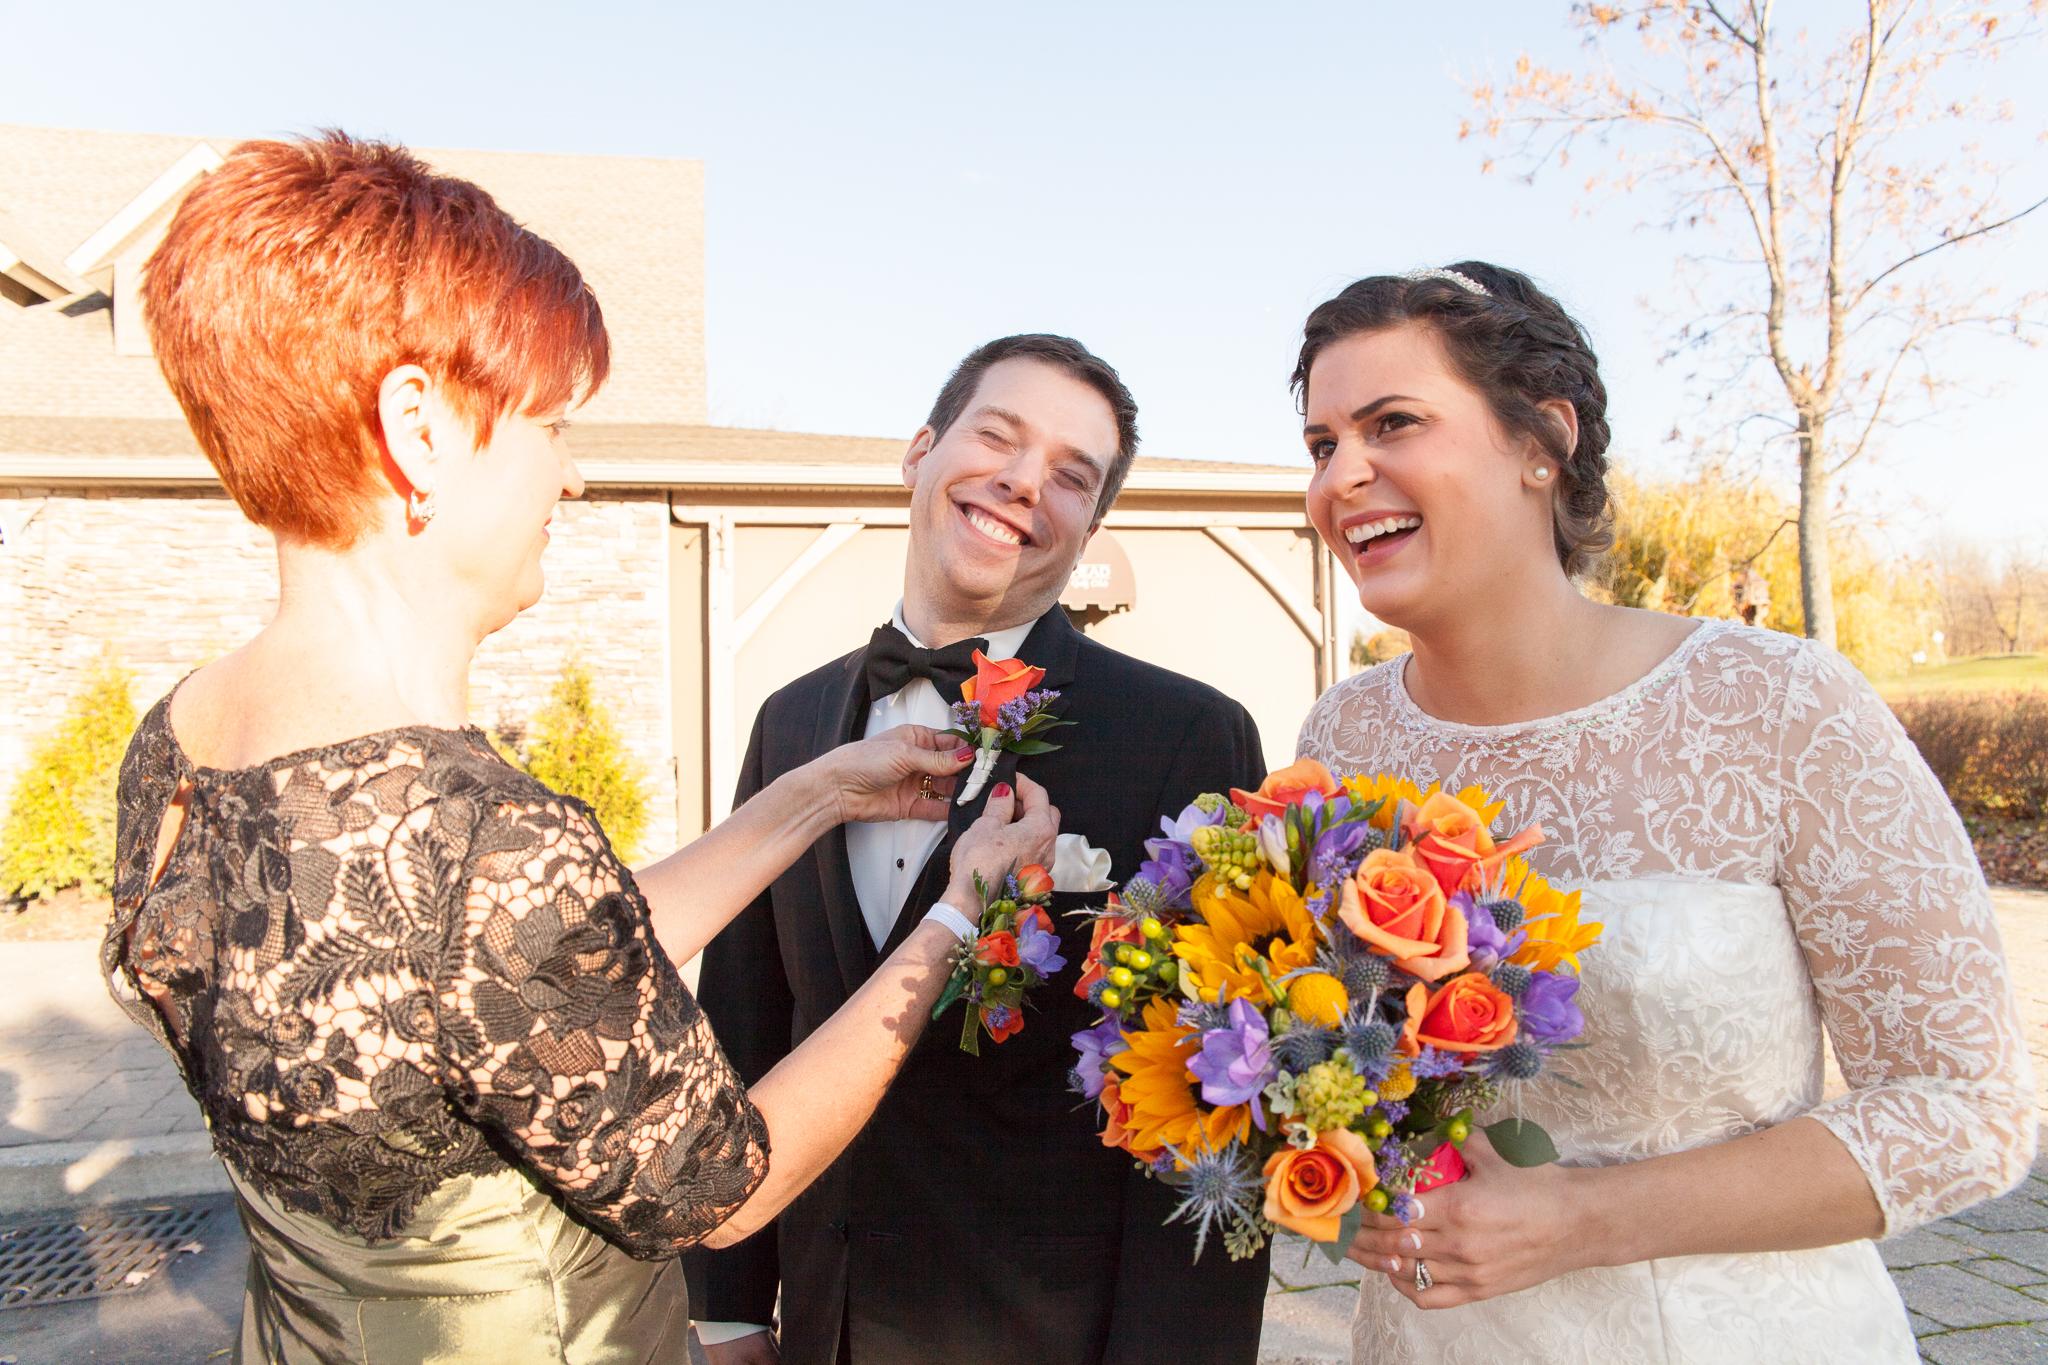 camuglia-whomstudio-chelsea_and_andy-nycphotographer-wedding-brooklyn-buffalo-timberlodge-023-0090.jpg